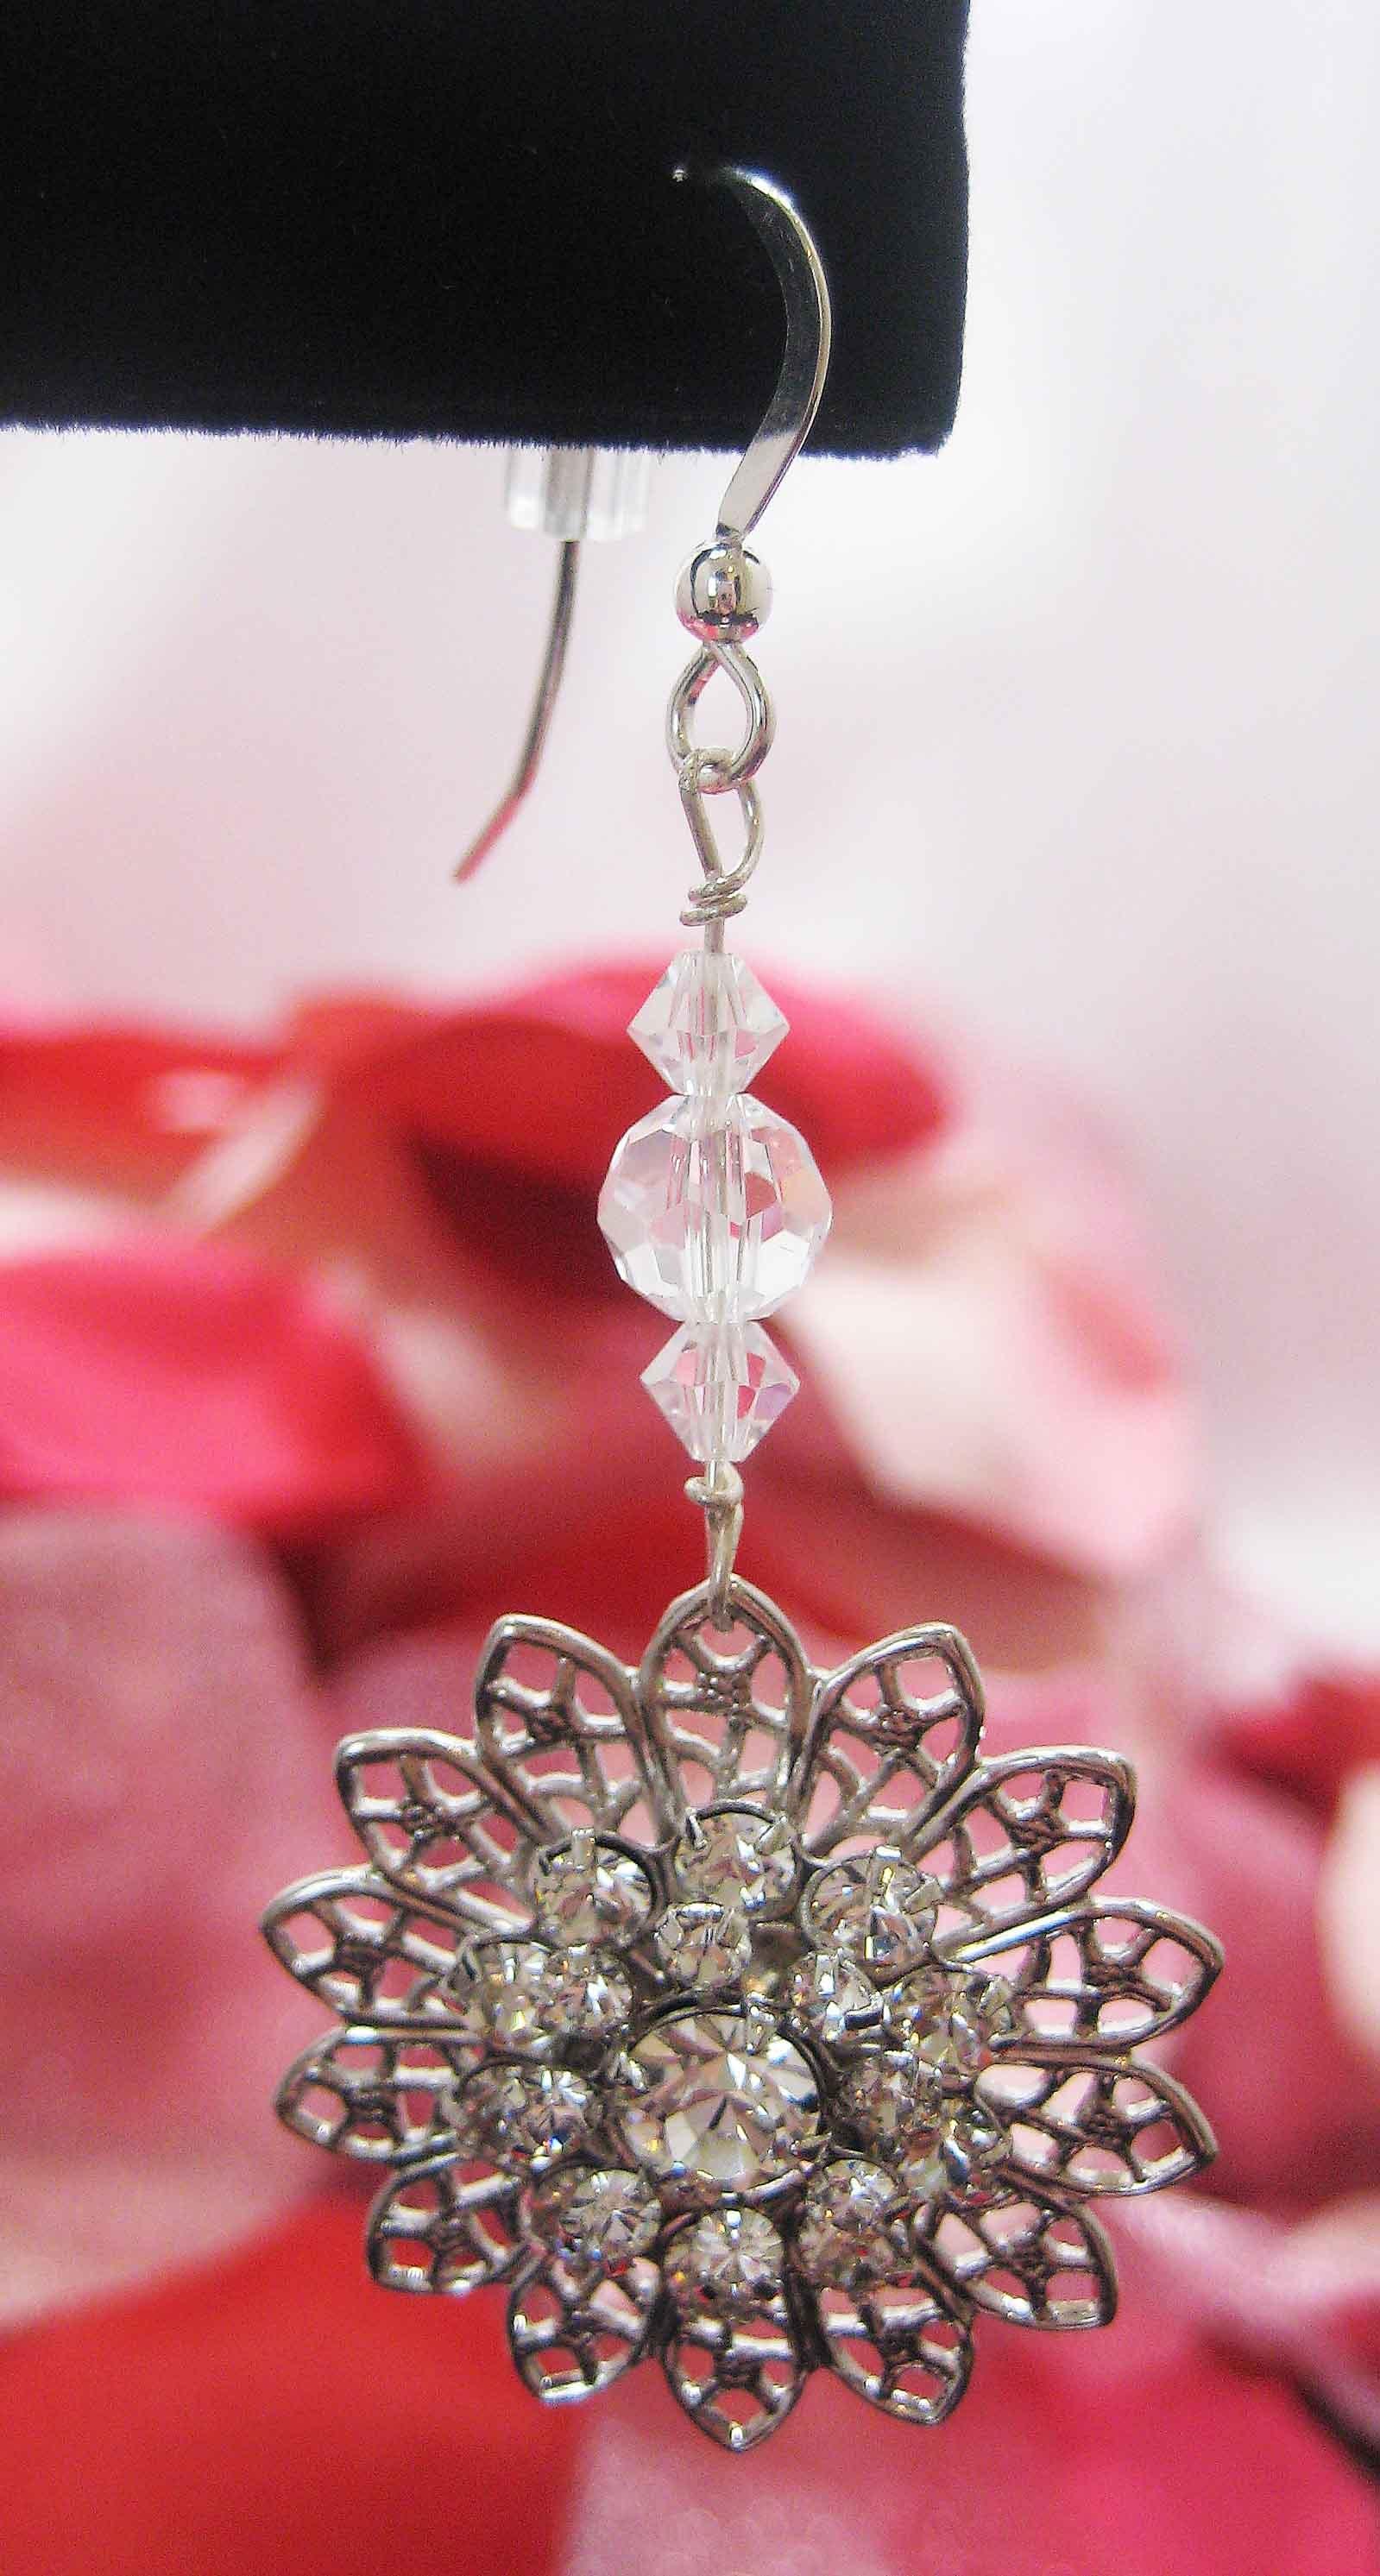 Jewelry, Bridesmaids, Bridesmaids Dresses, Fashion, Bracelets, Earrings, Custom, Bridal, Necklace, Bracelet, Design, Handmade, Bella jewelariacom